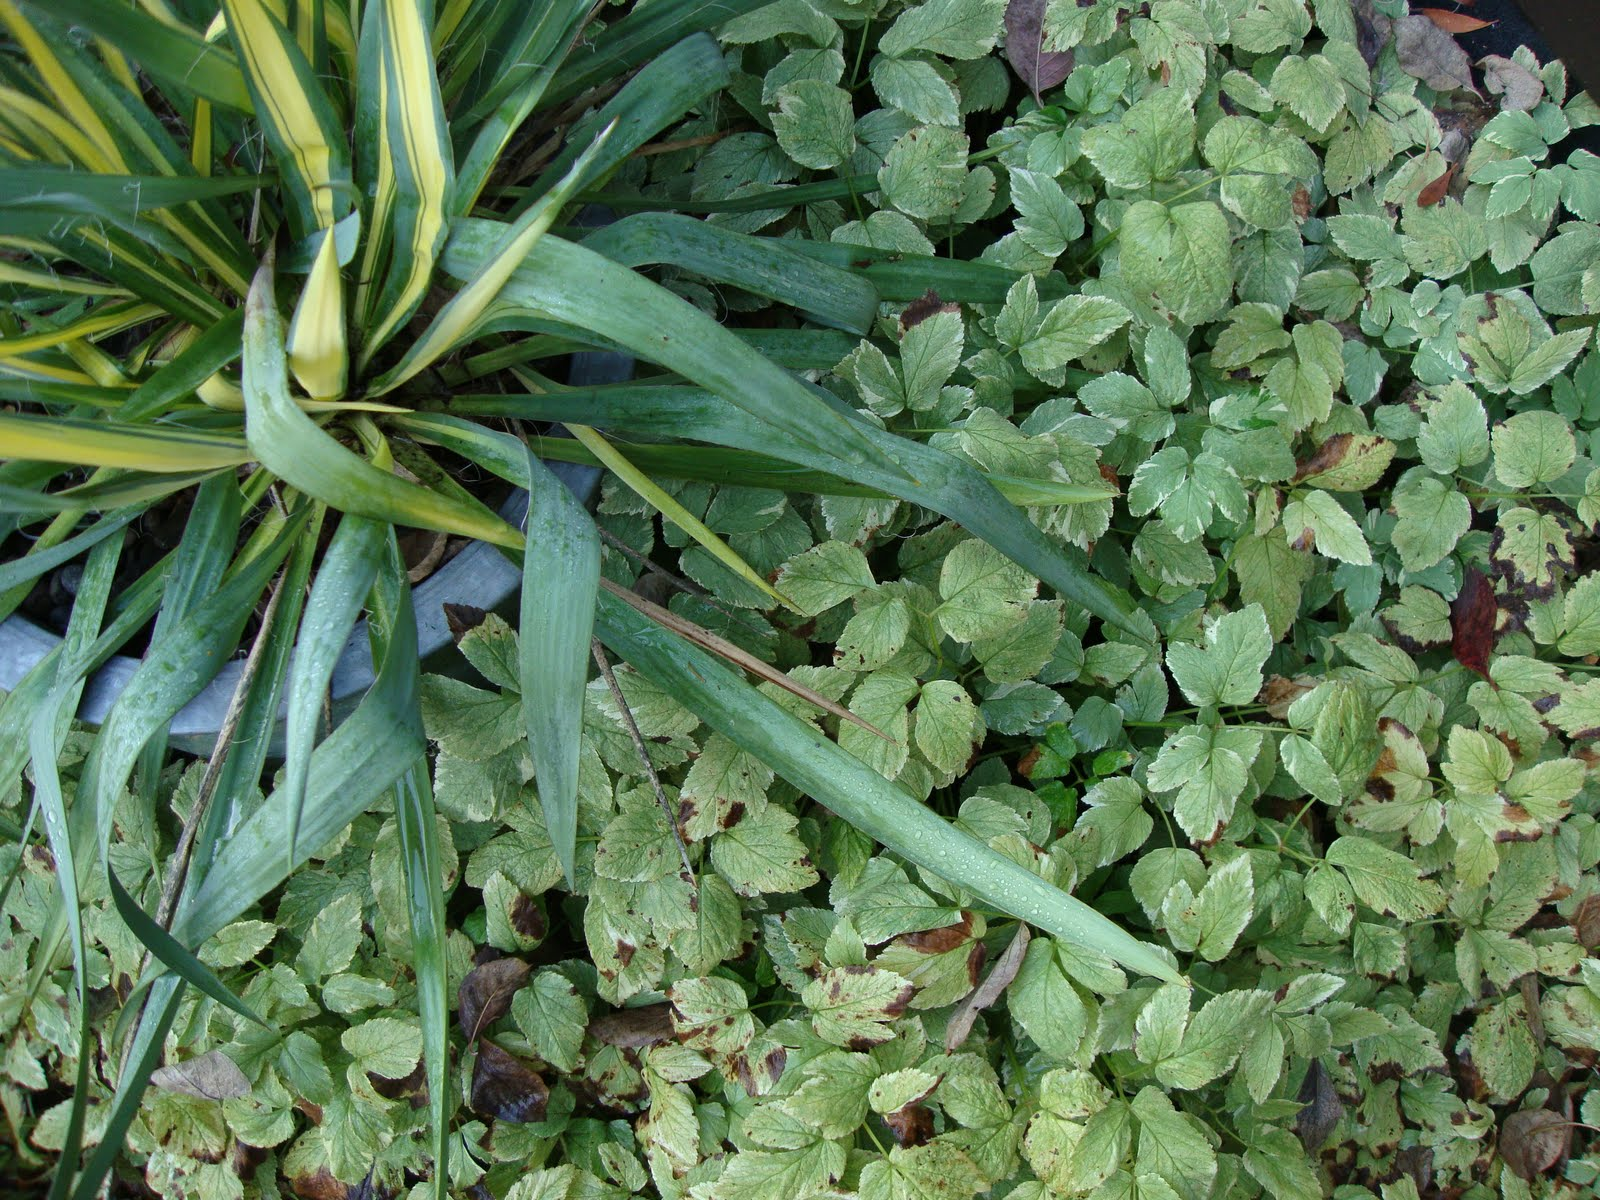 aegopodium podagraria how to get rid of